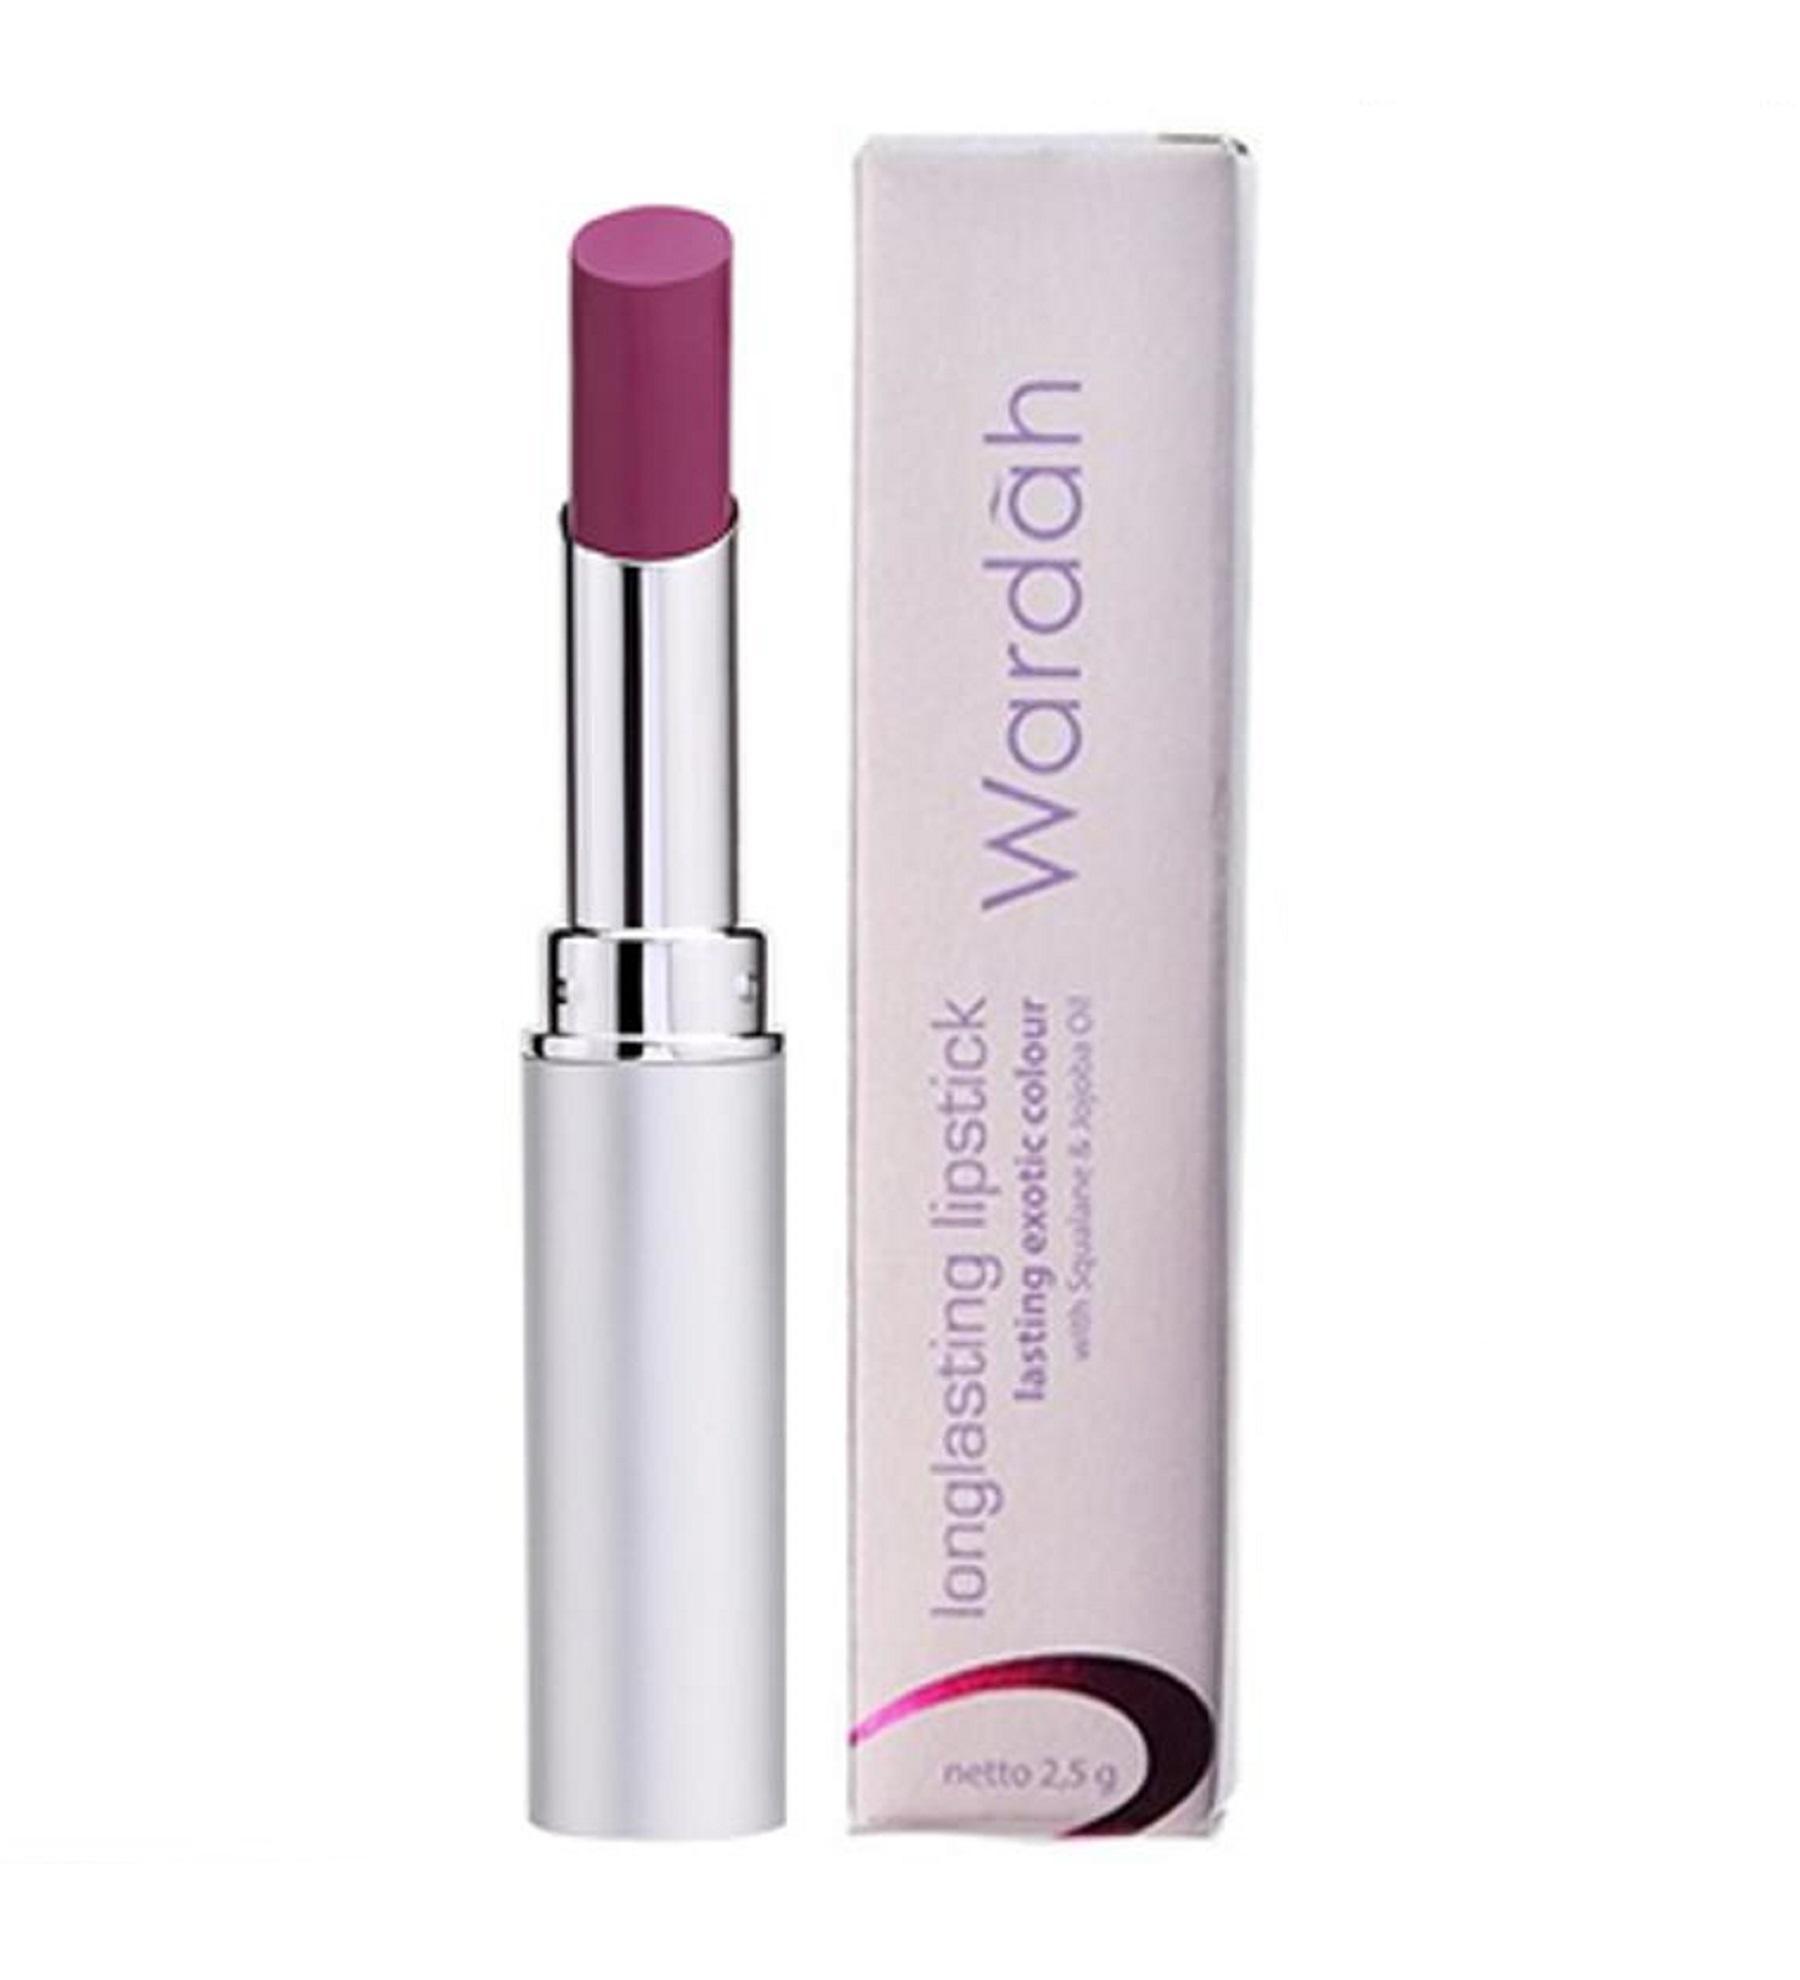 Wardah Long Lasting Lipstick No.05 Fuchsia Fever